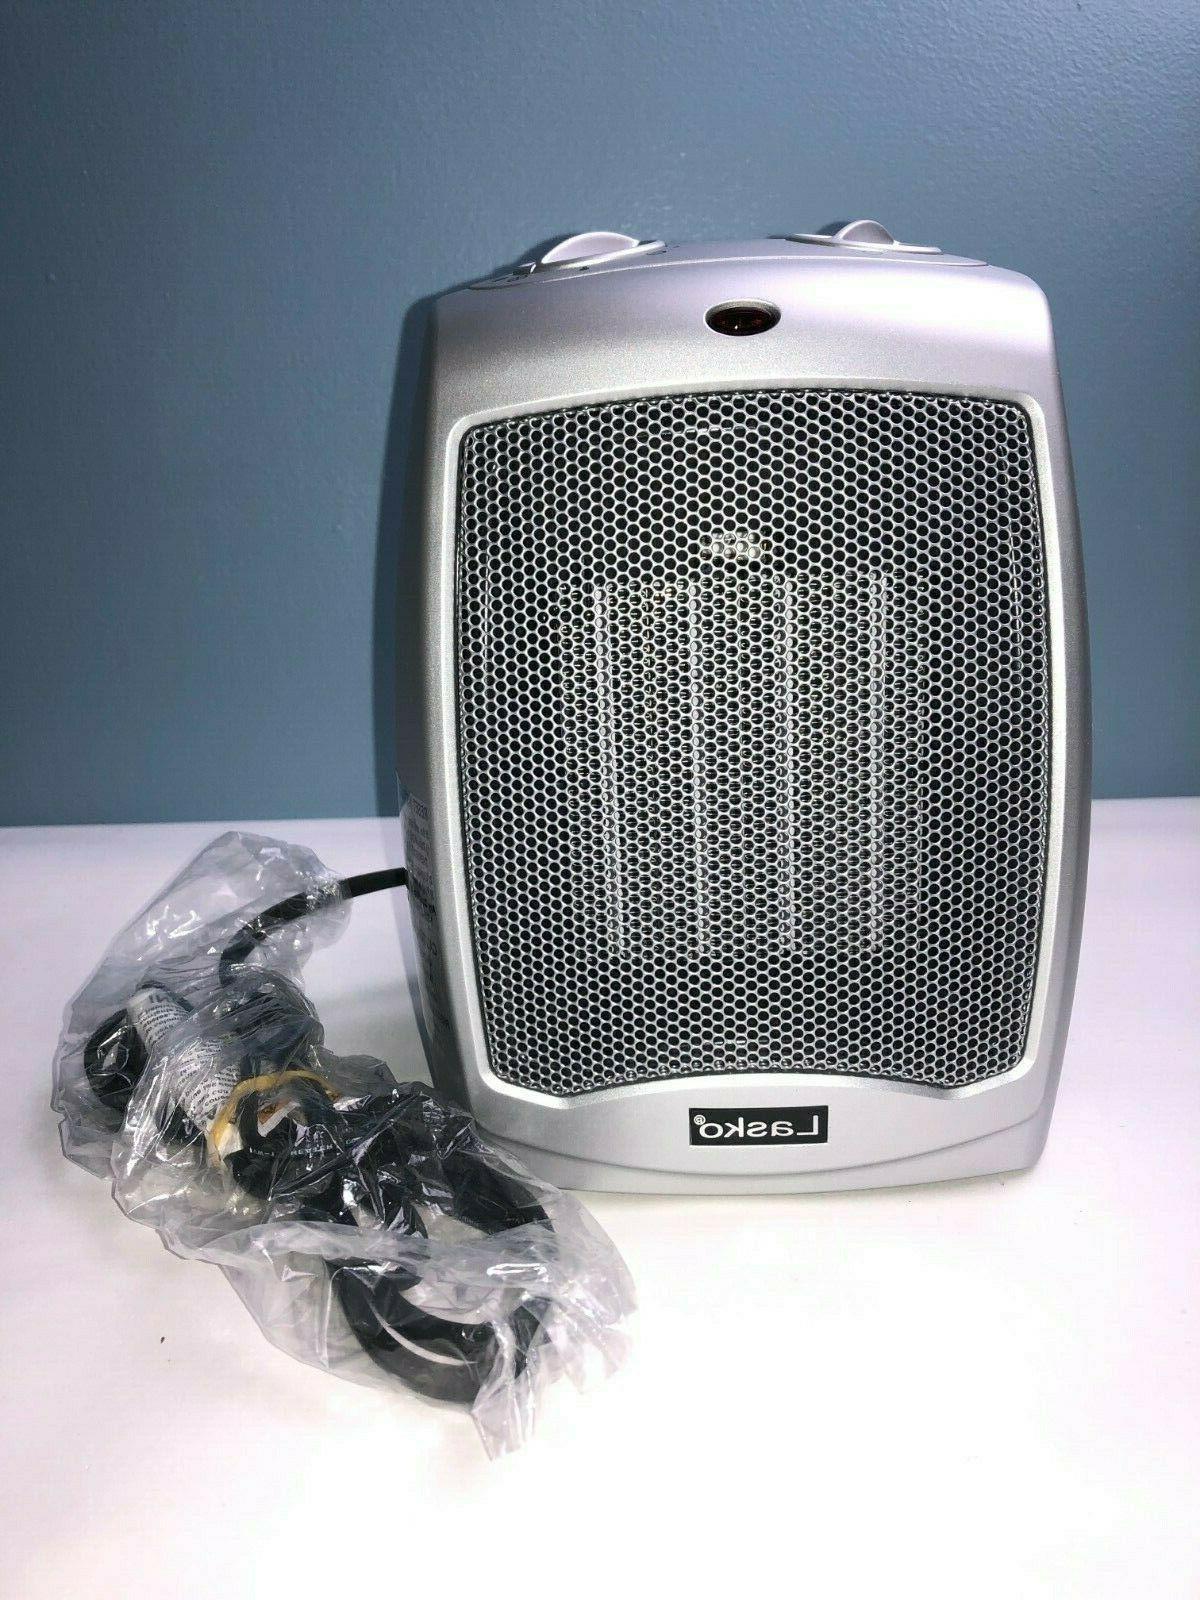 heater 754200 ceramic portable space